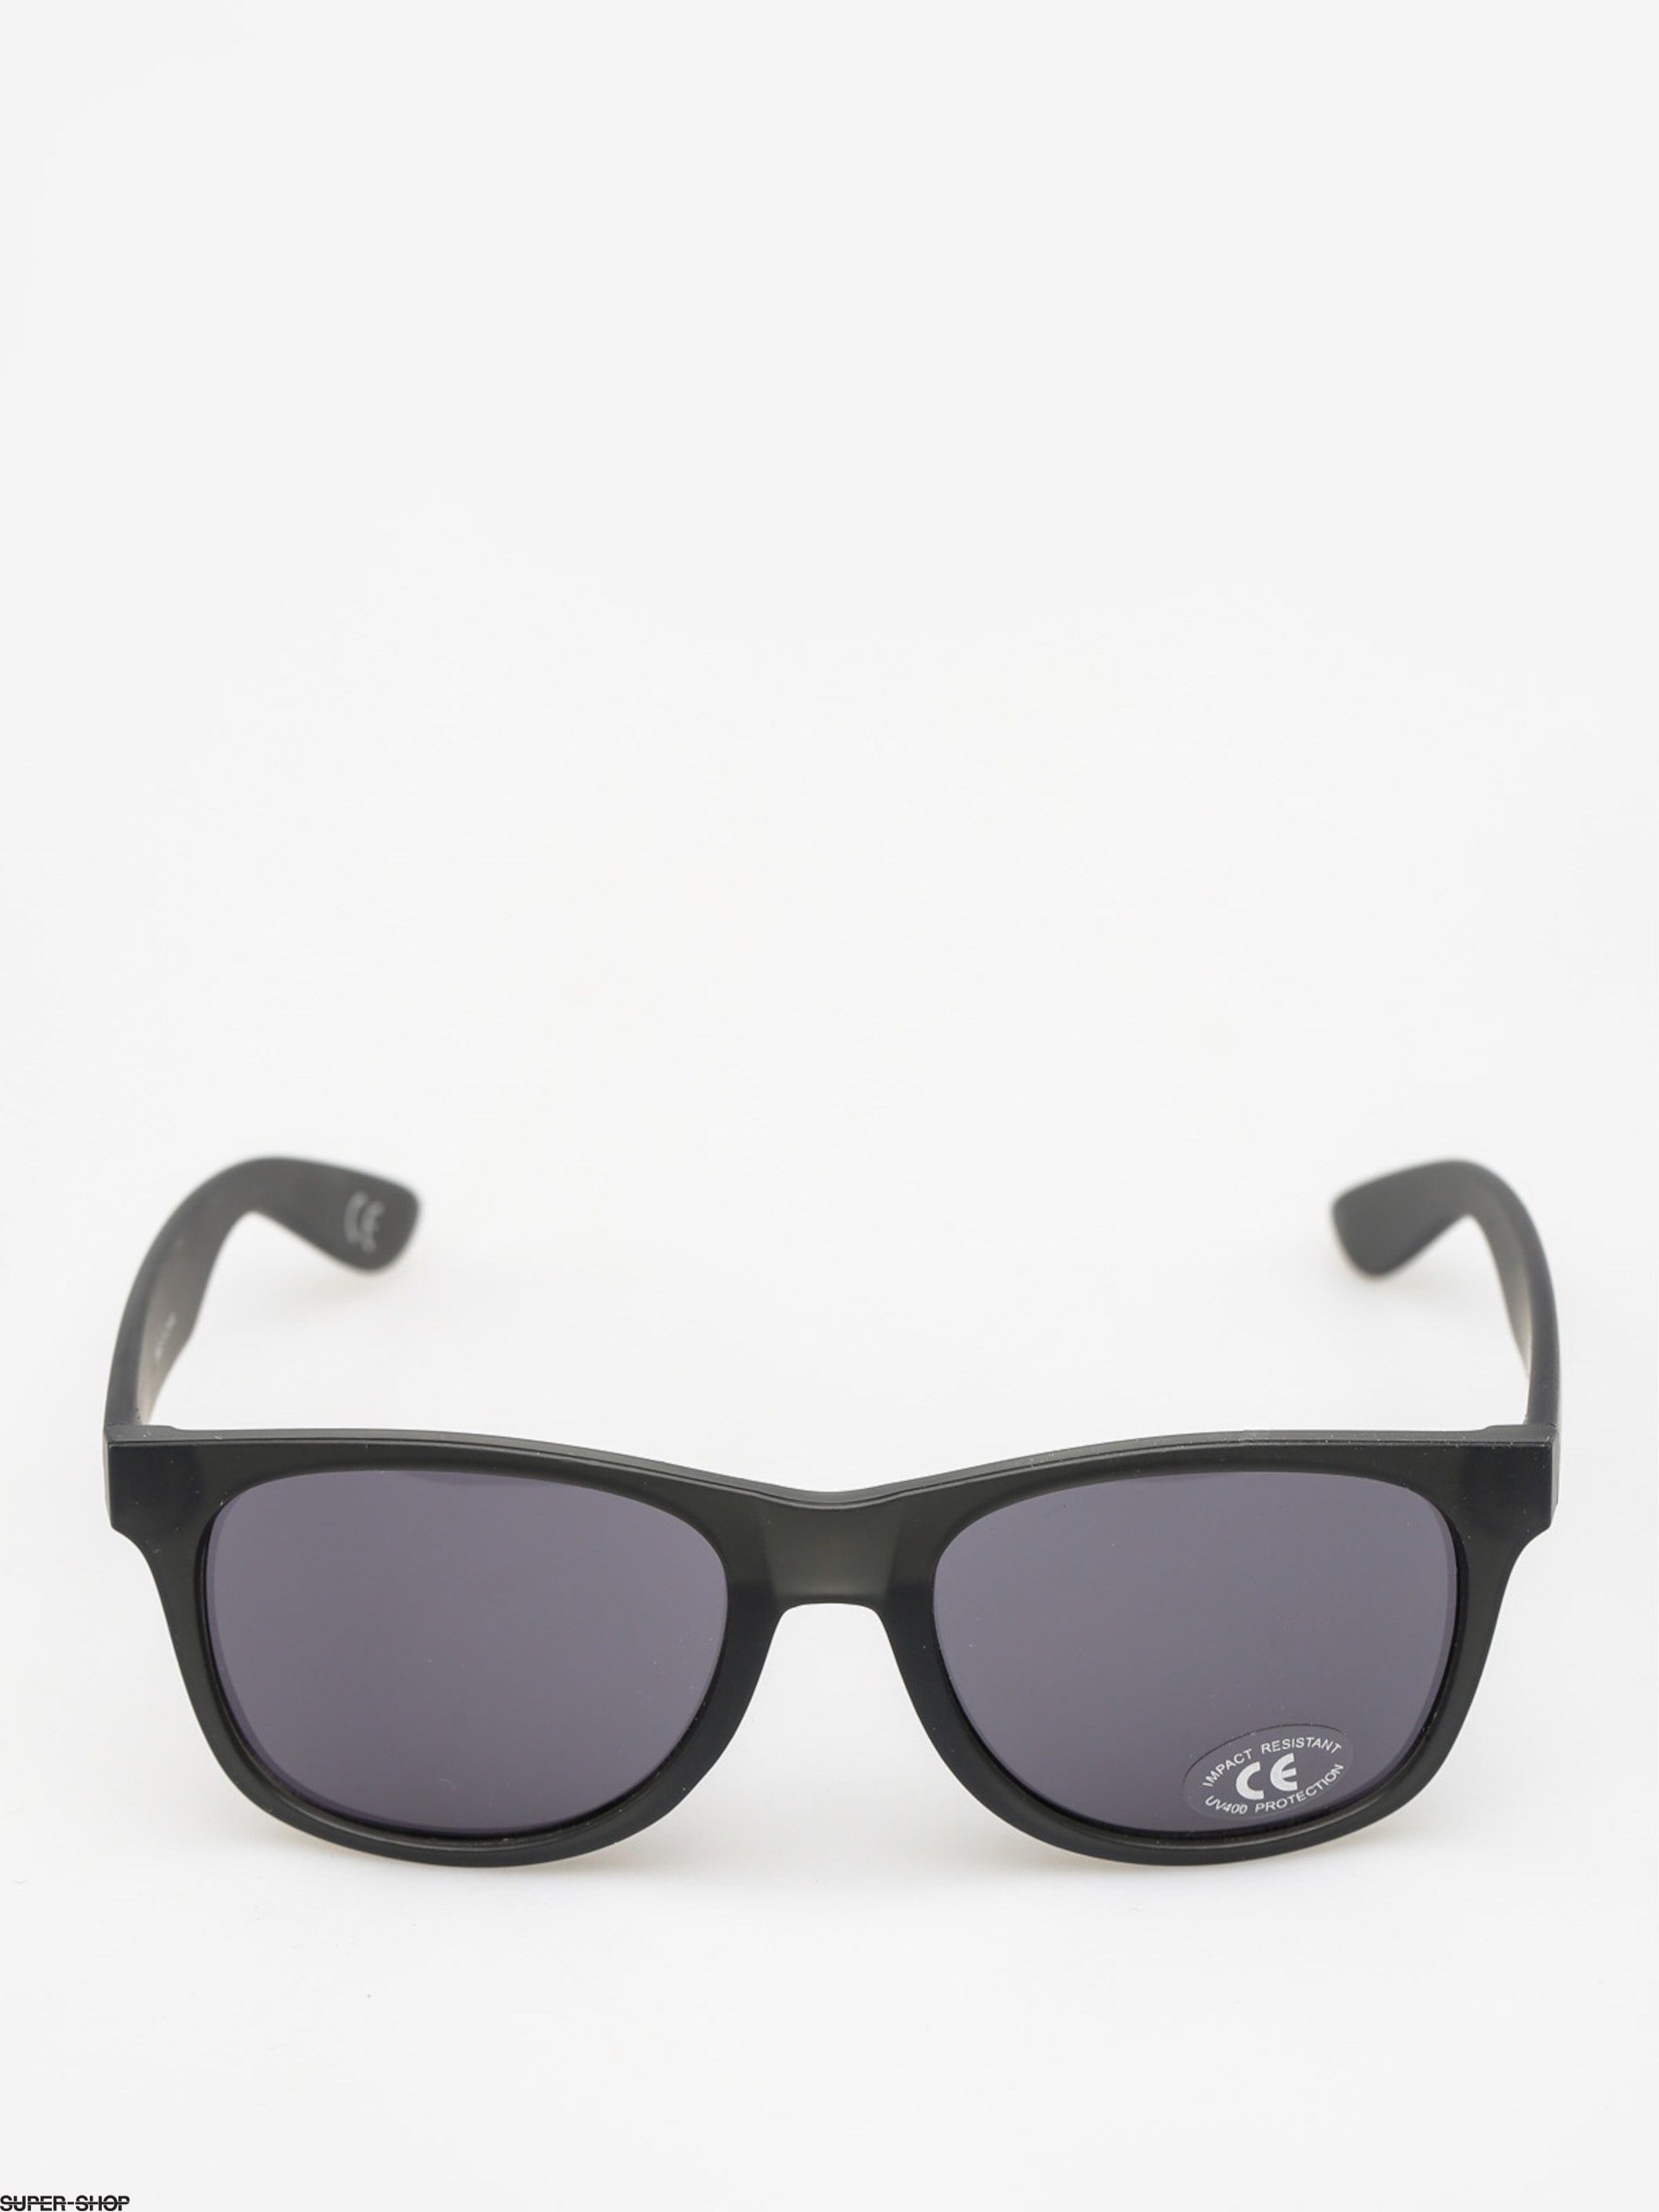 a06cd799849 Vans sunglasses Spicoli 4 (black frosted t)